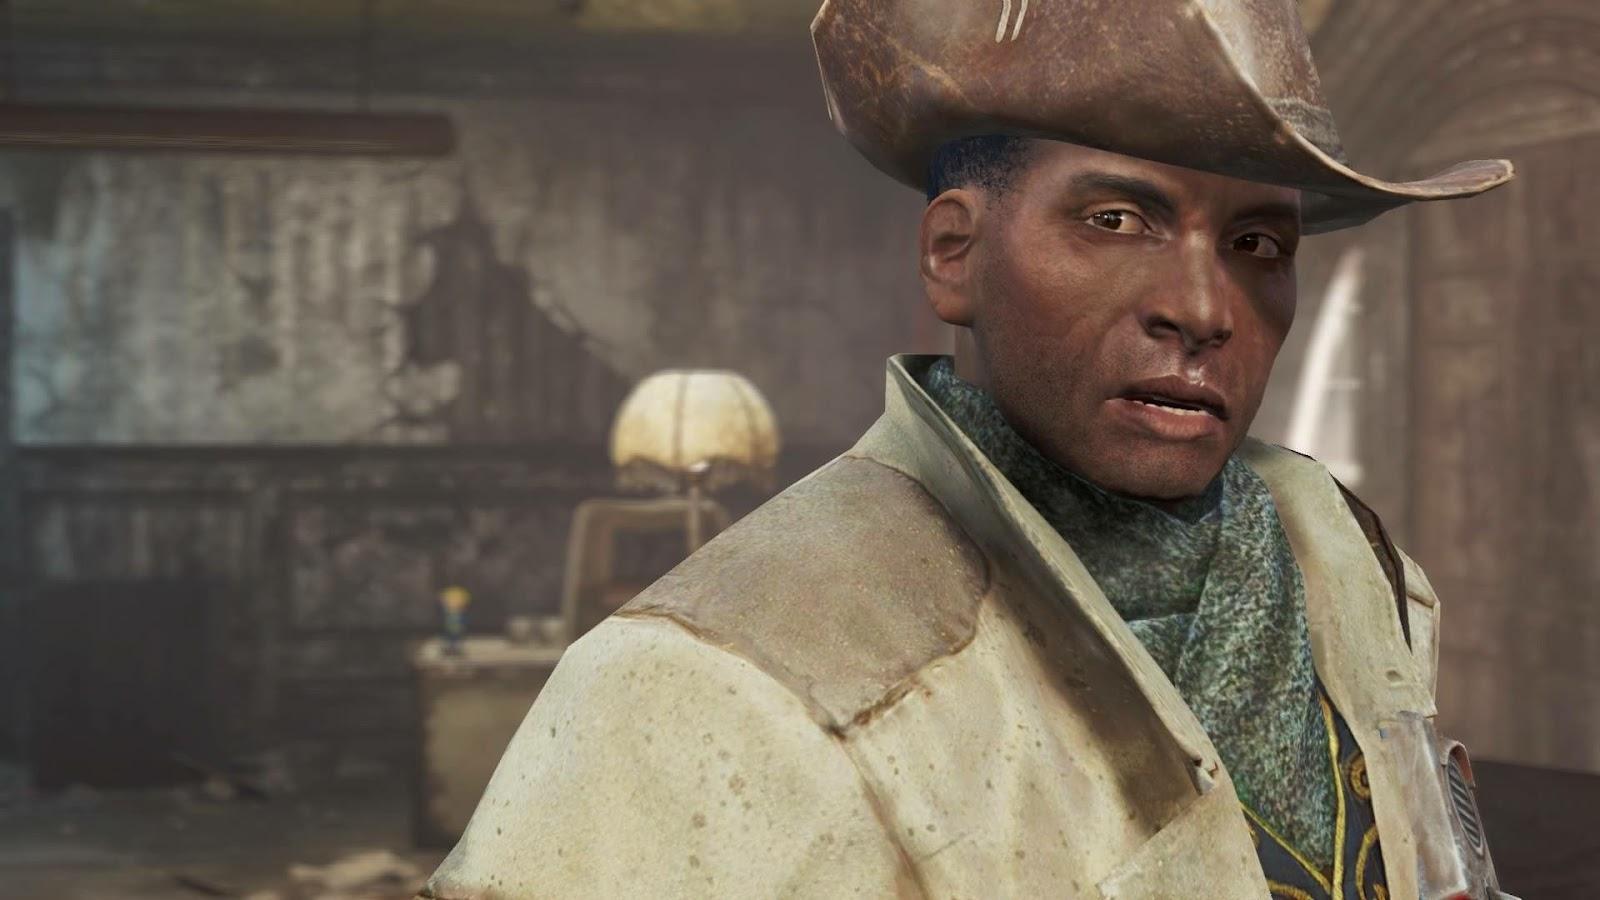 Preston Garvey fallout 4 best companions